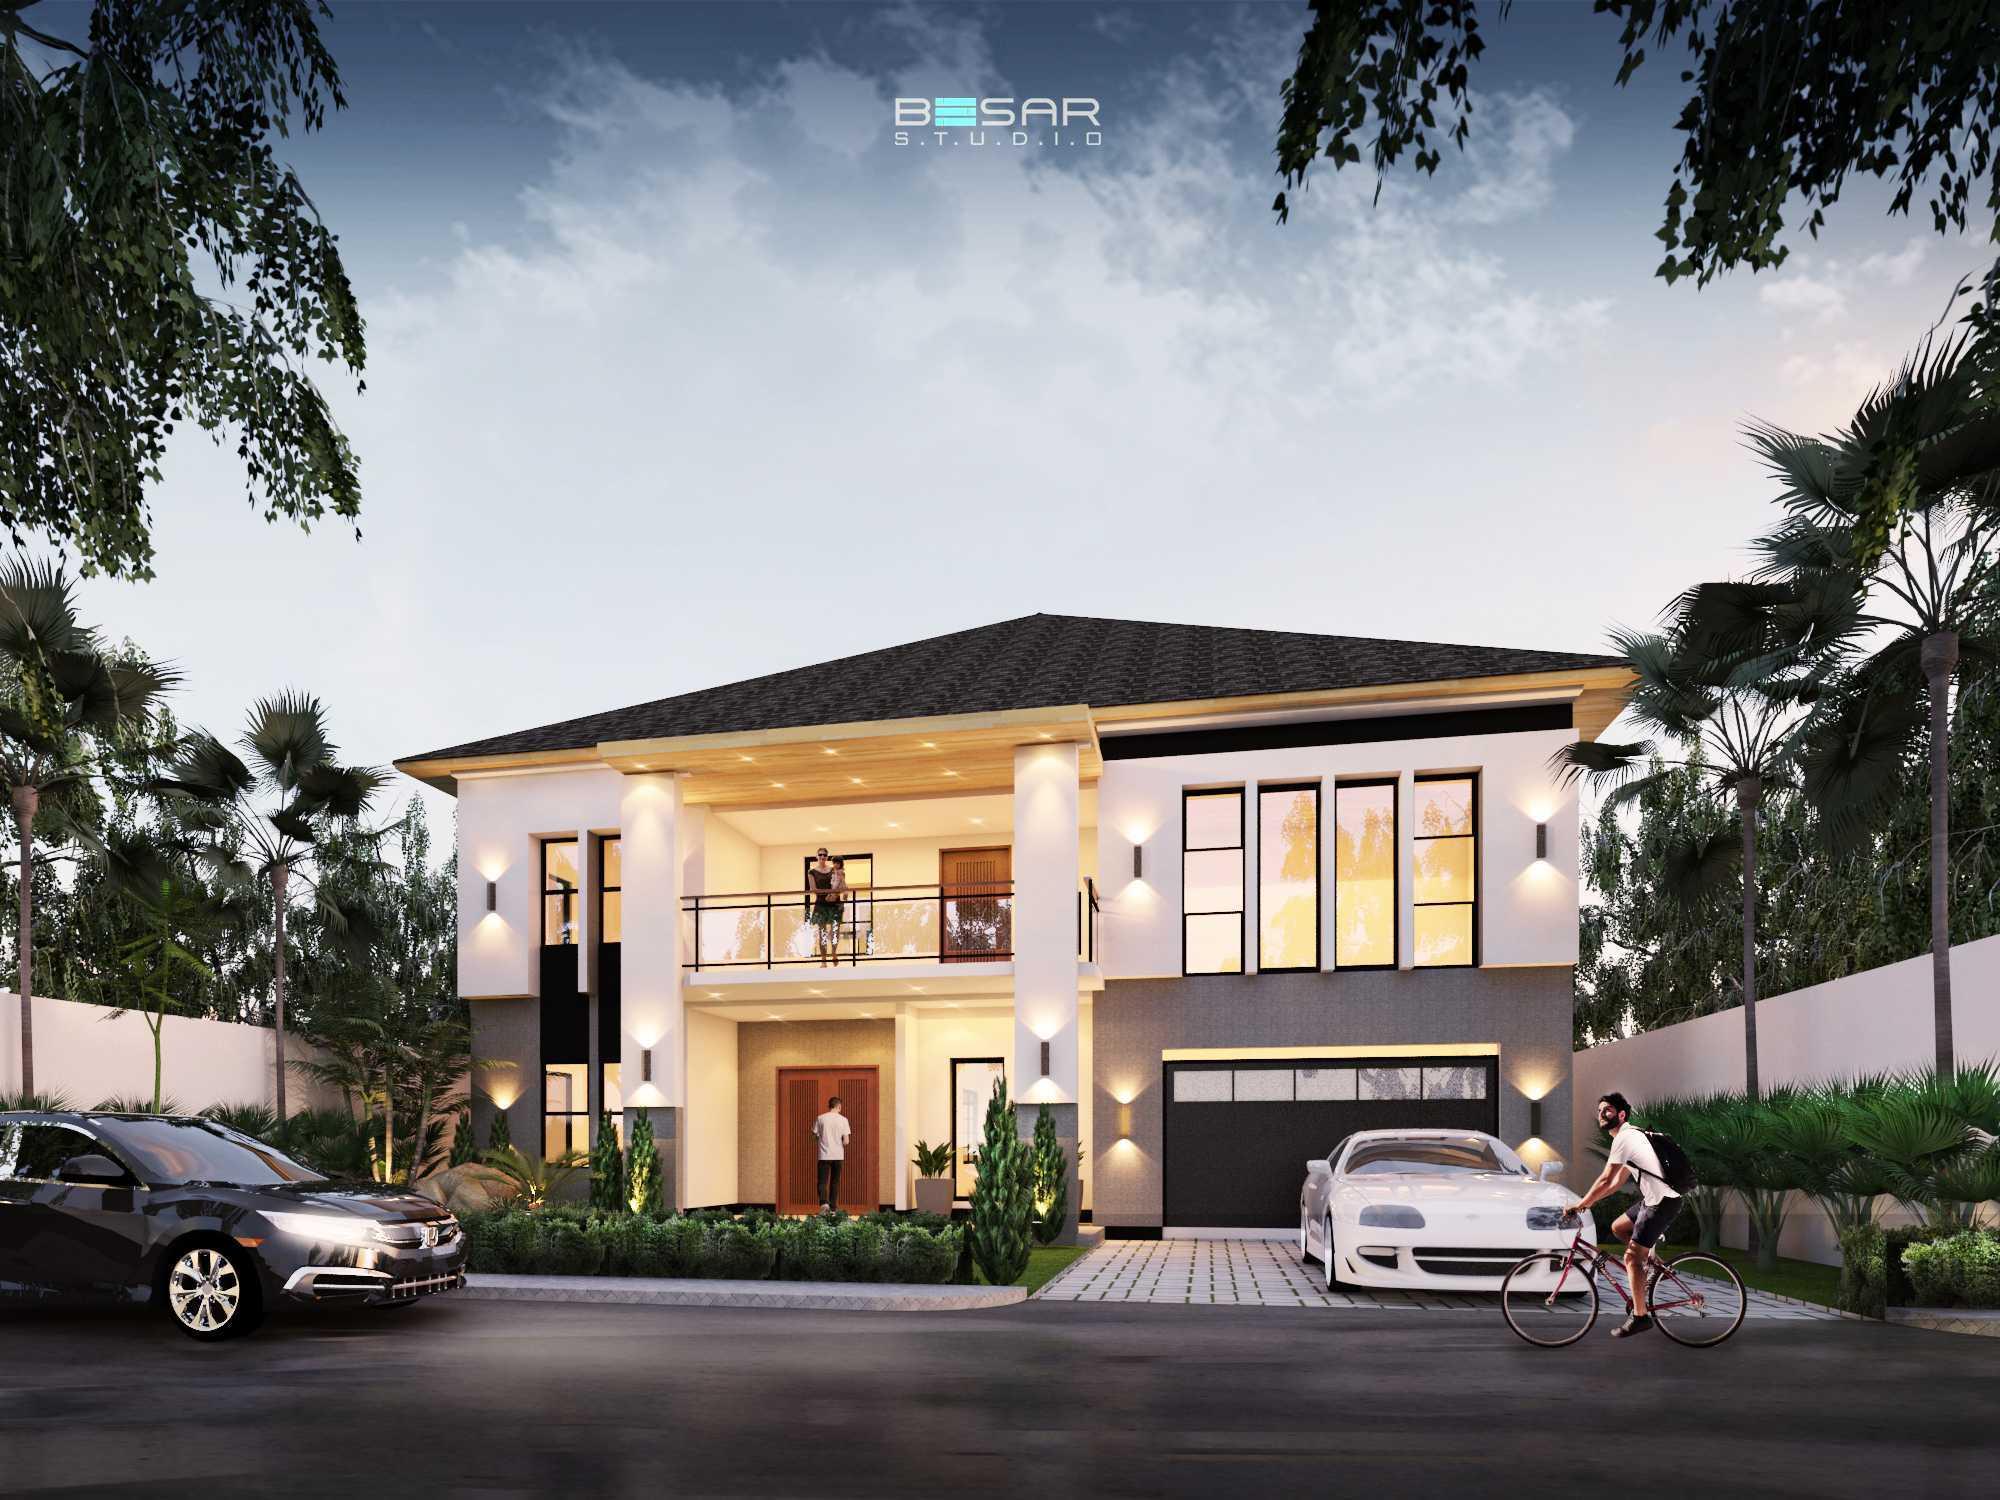 Studio Besar Kayu Putih House, Jakarta Jakarta, Daerah Khusus Ibukota Jakarta, Indonesia Jakarta, Daerah Khusus Ibukota Jakarta, Indonesia Jepang-1   36978